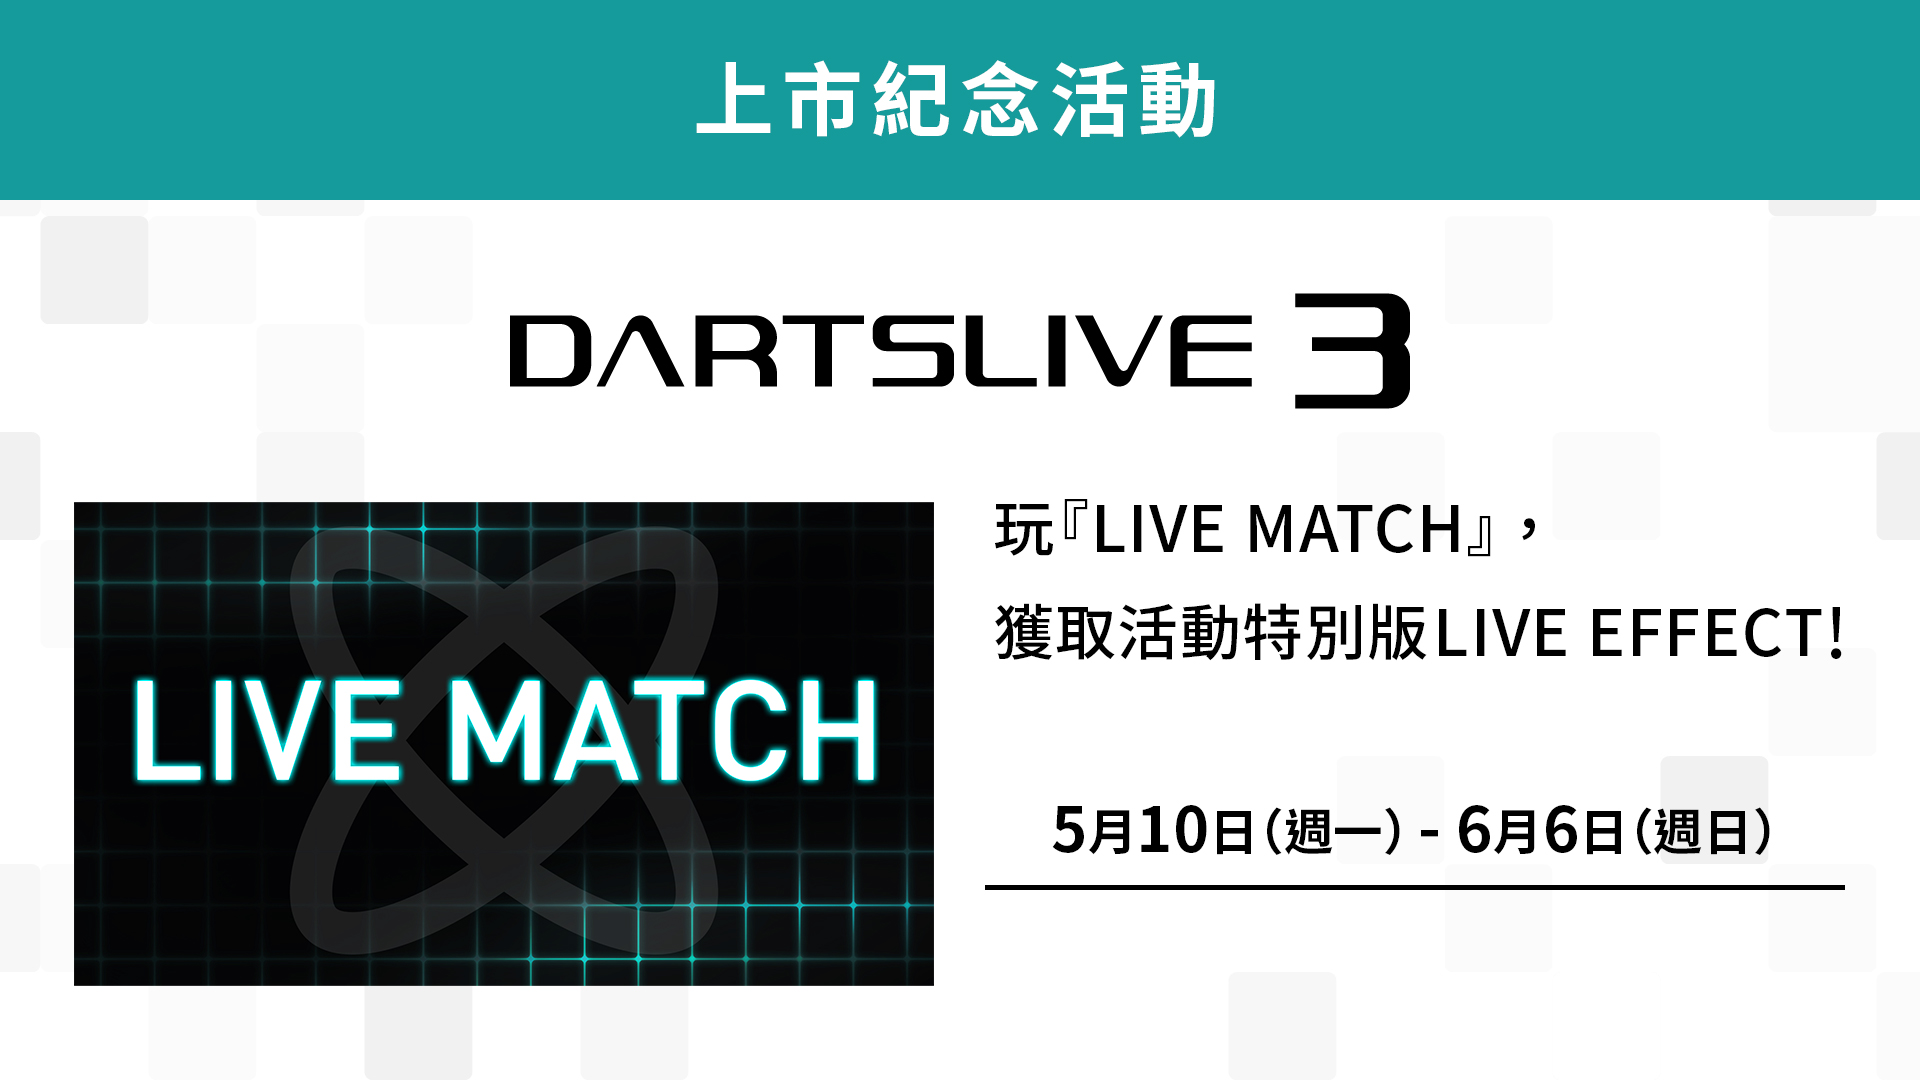 DARTSLIVE3上市紀念活動『LIVE MATCH』開始!